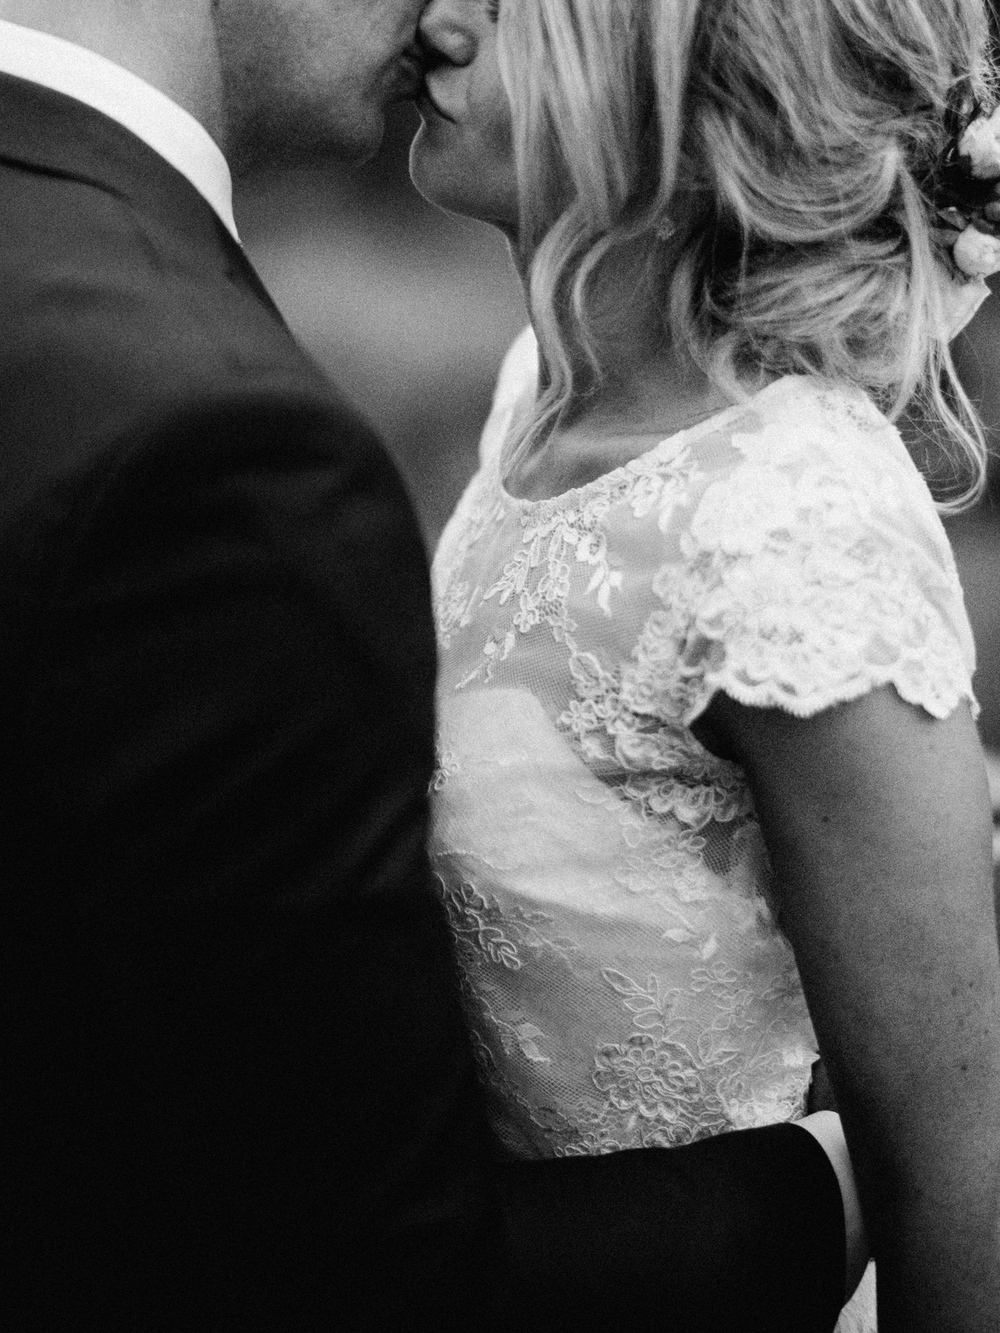 new-zealand-wedding-film-photographer-ryan-flynn-0056.JPG